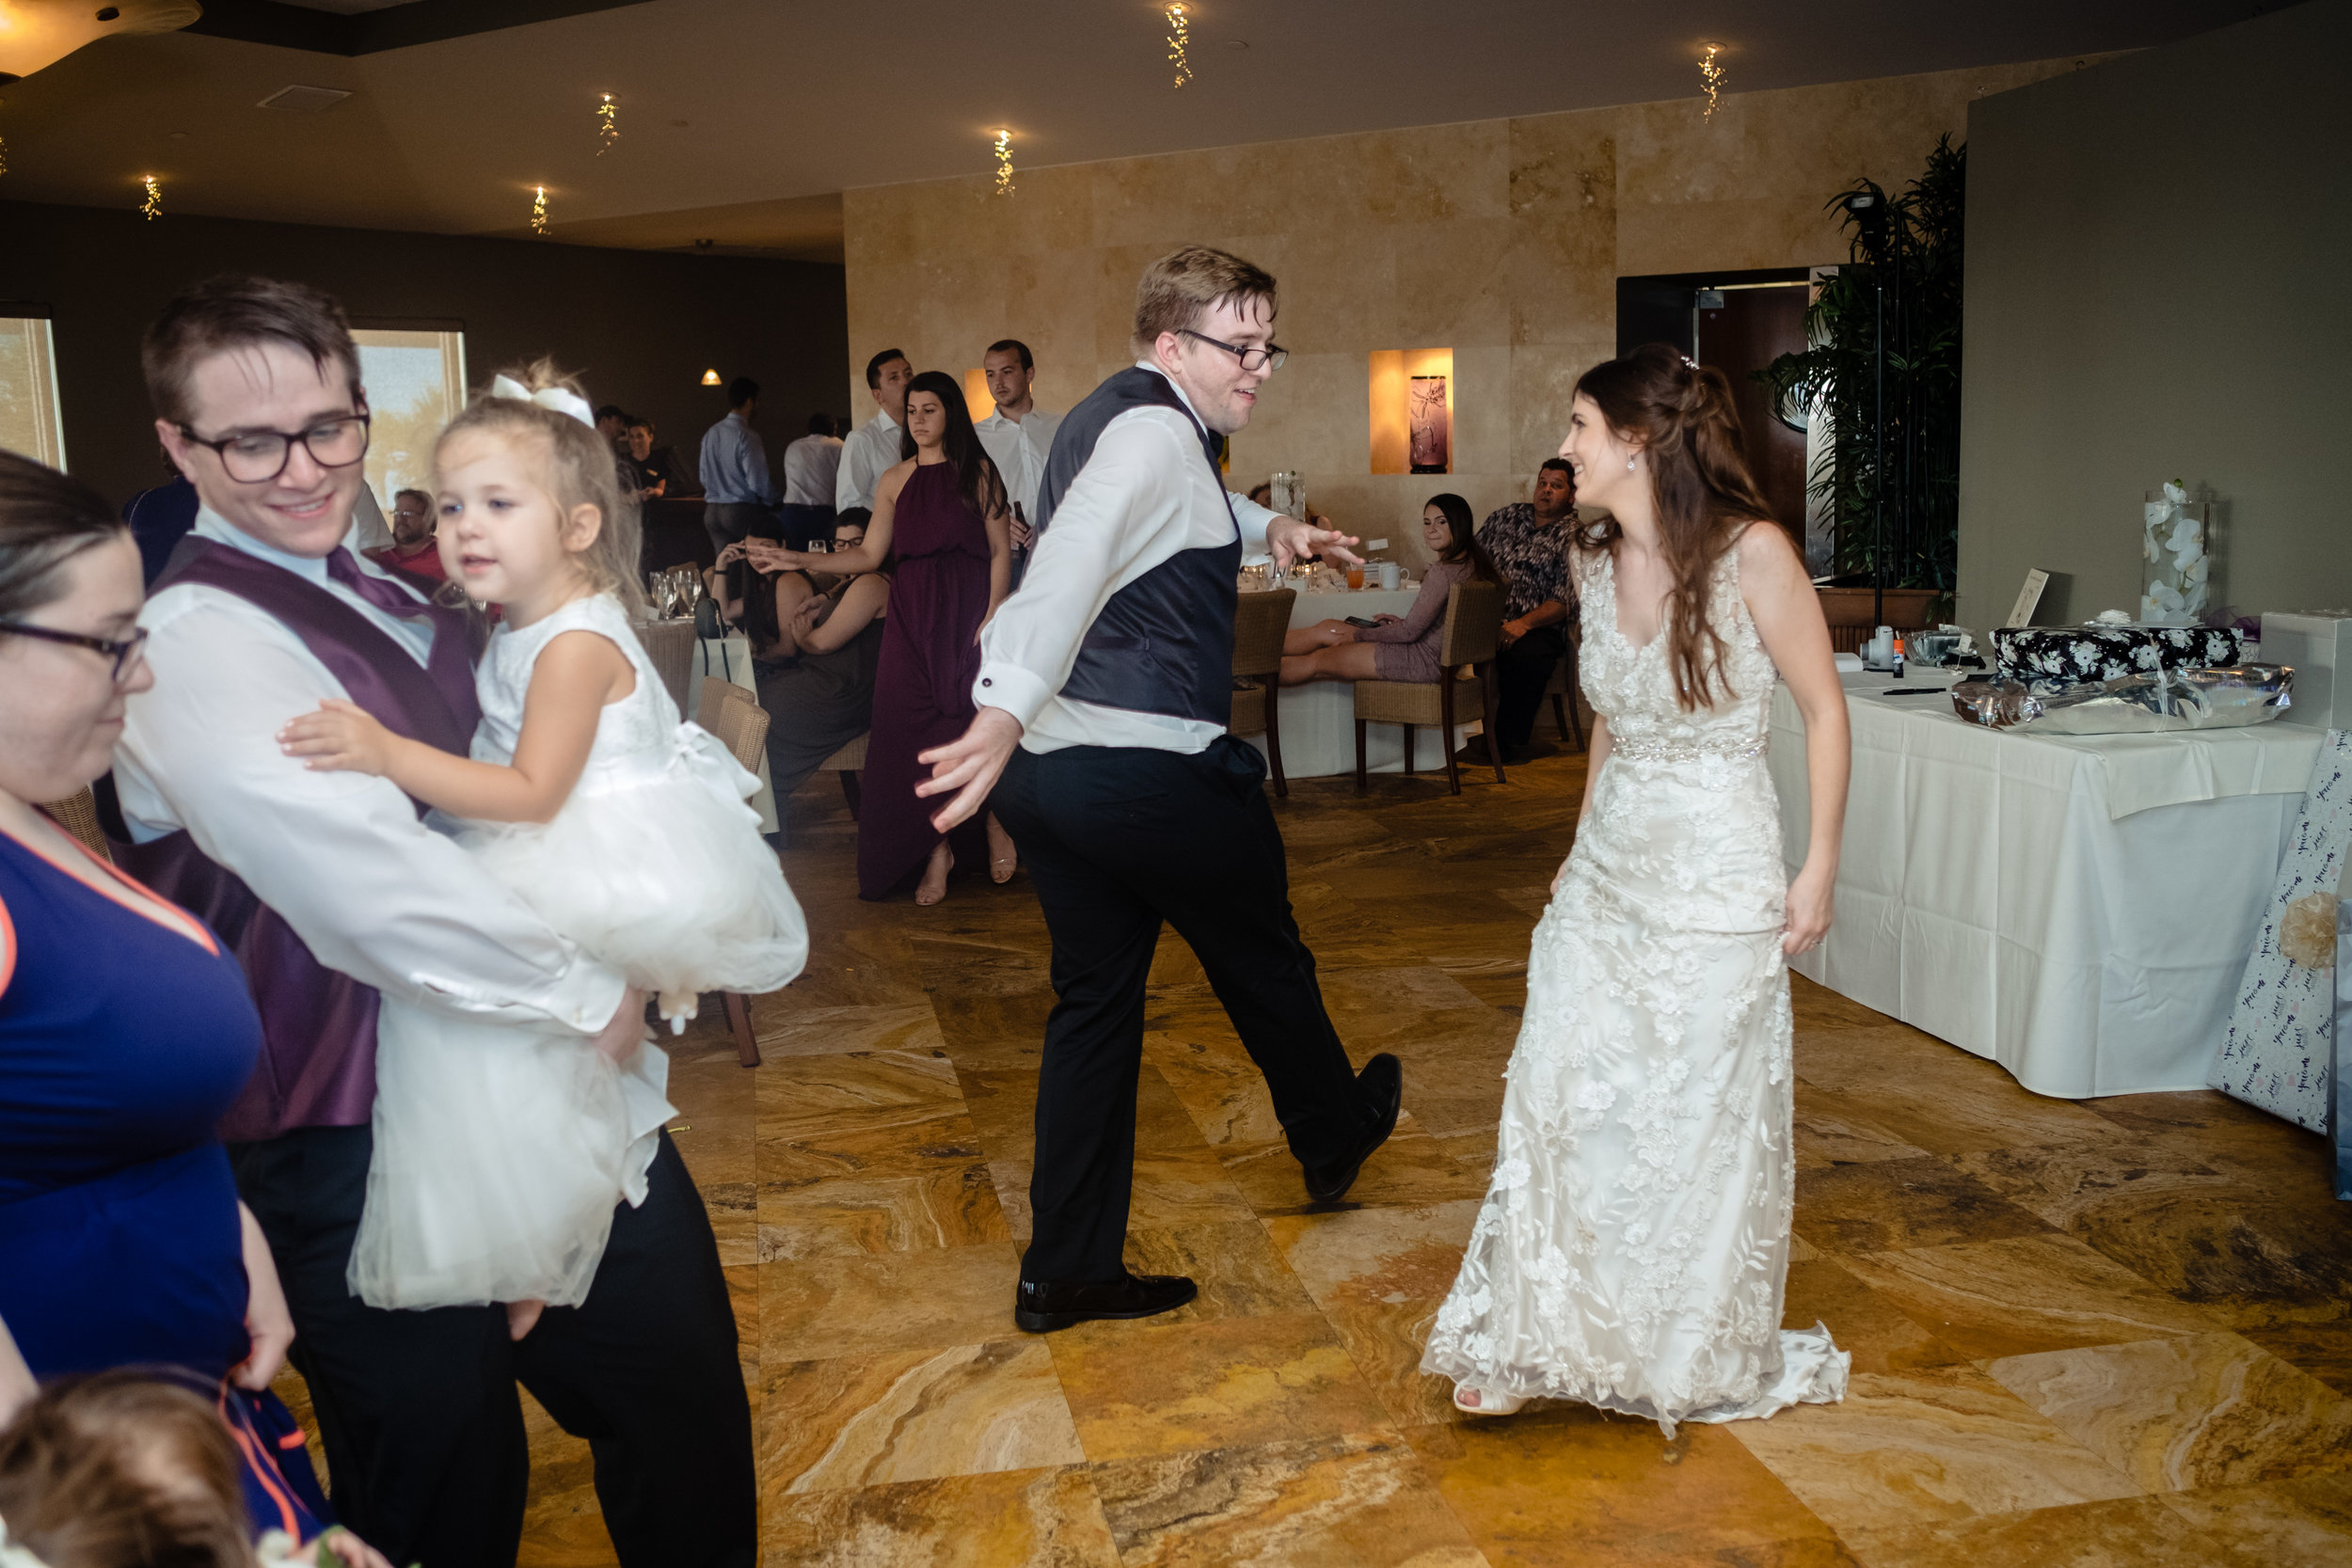 HAH_Zoe and Daniel_Clearwater Wedding_737_2018.jpg